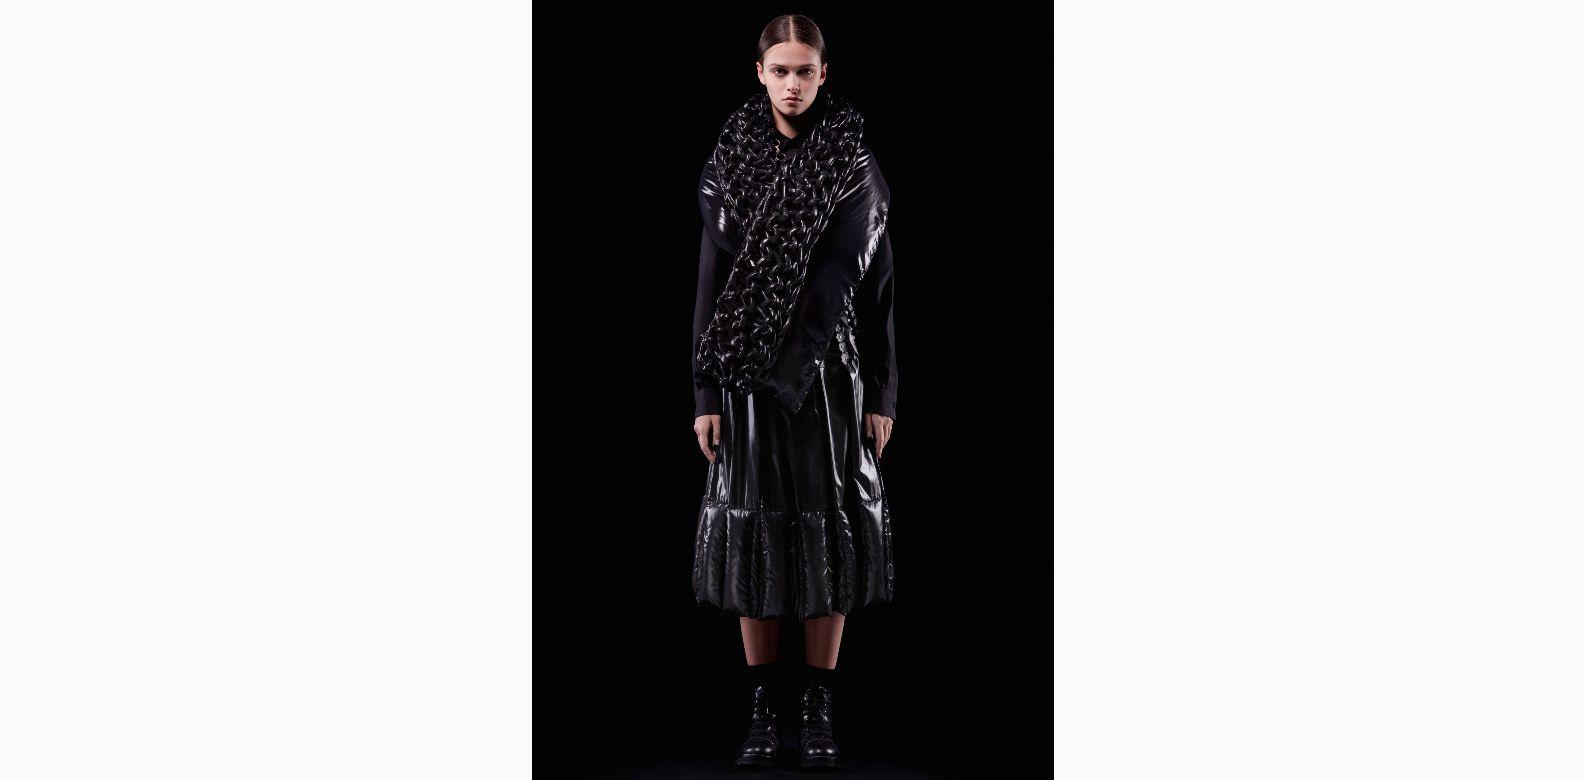 6. Moncler Noir Kei Ninomiya - Wearable Geometry - Fall/Winter 2018